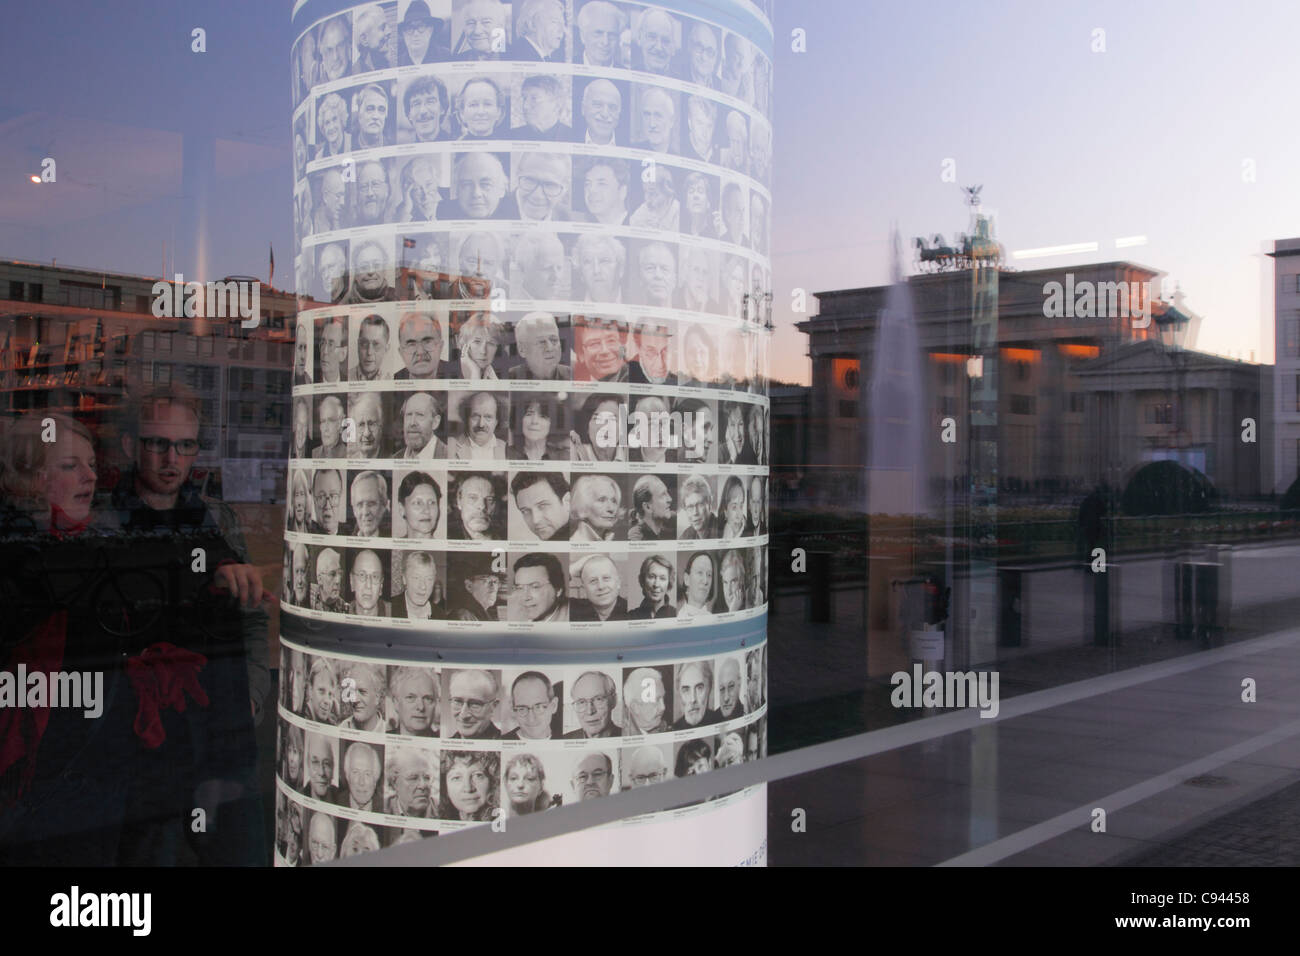 Academy of the Arts in Berlin and the mirroring Brandenburg Gate, Germany; Akademie der Künste in Berlin - Stock Image